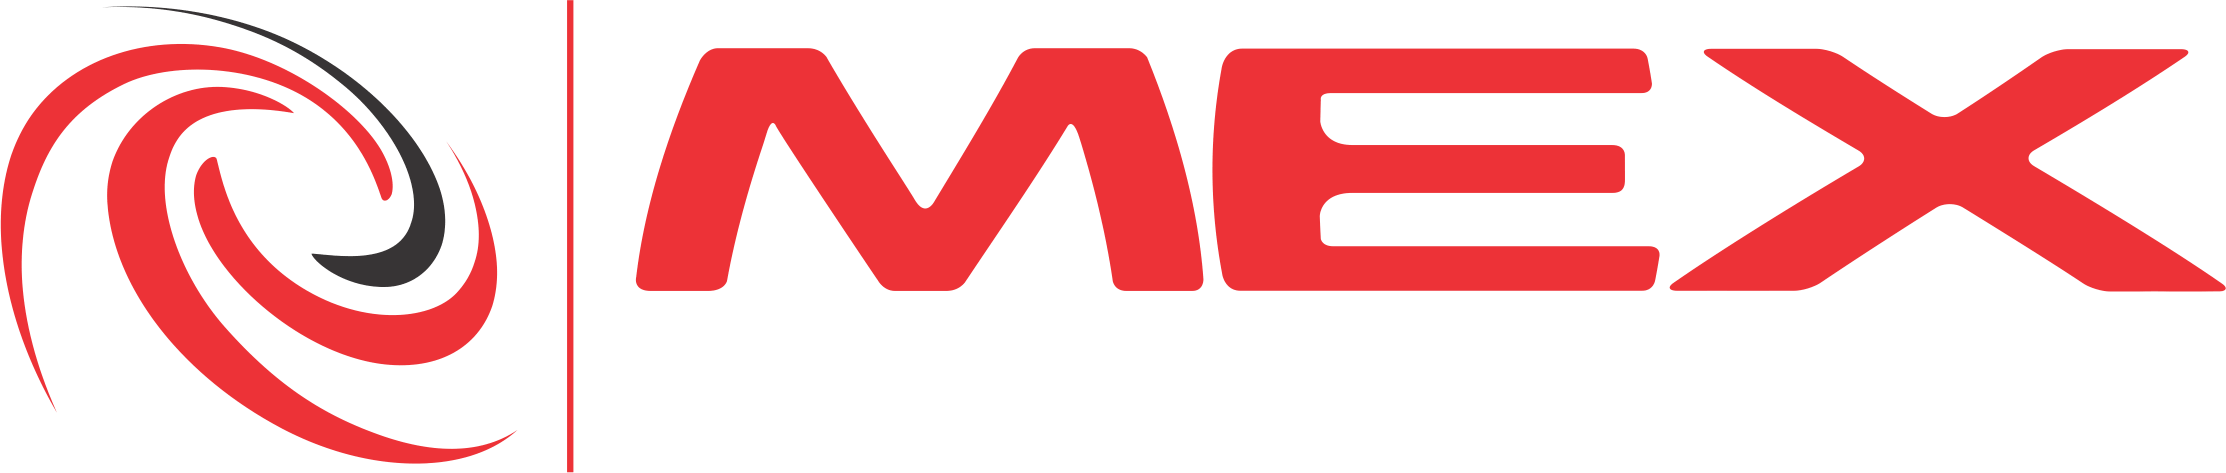 Mex Exhibition